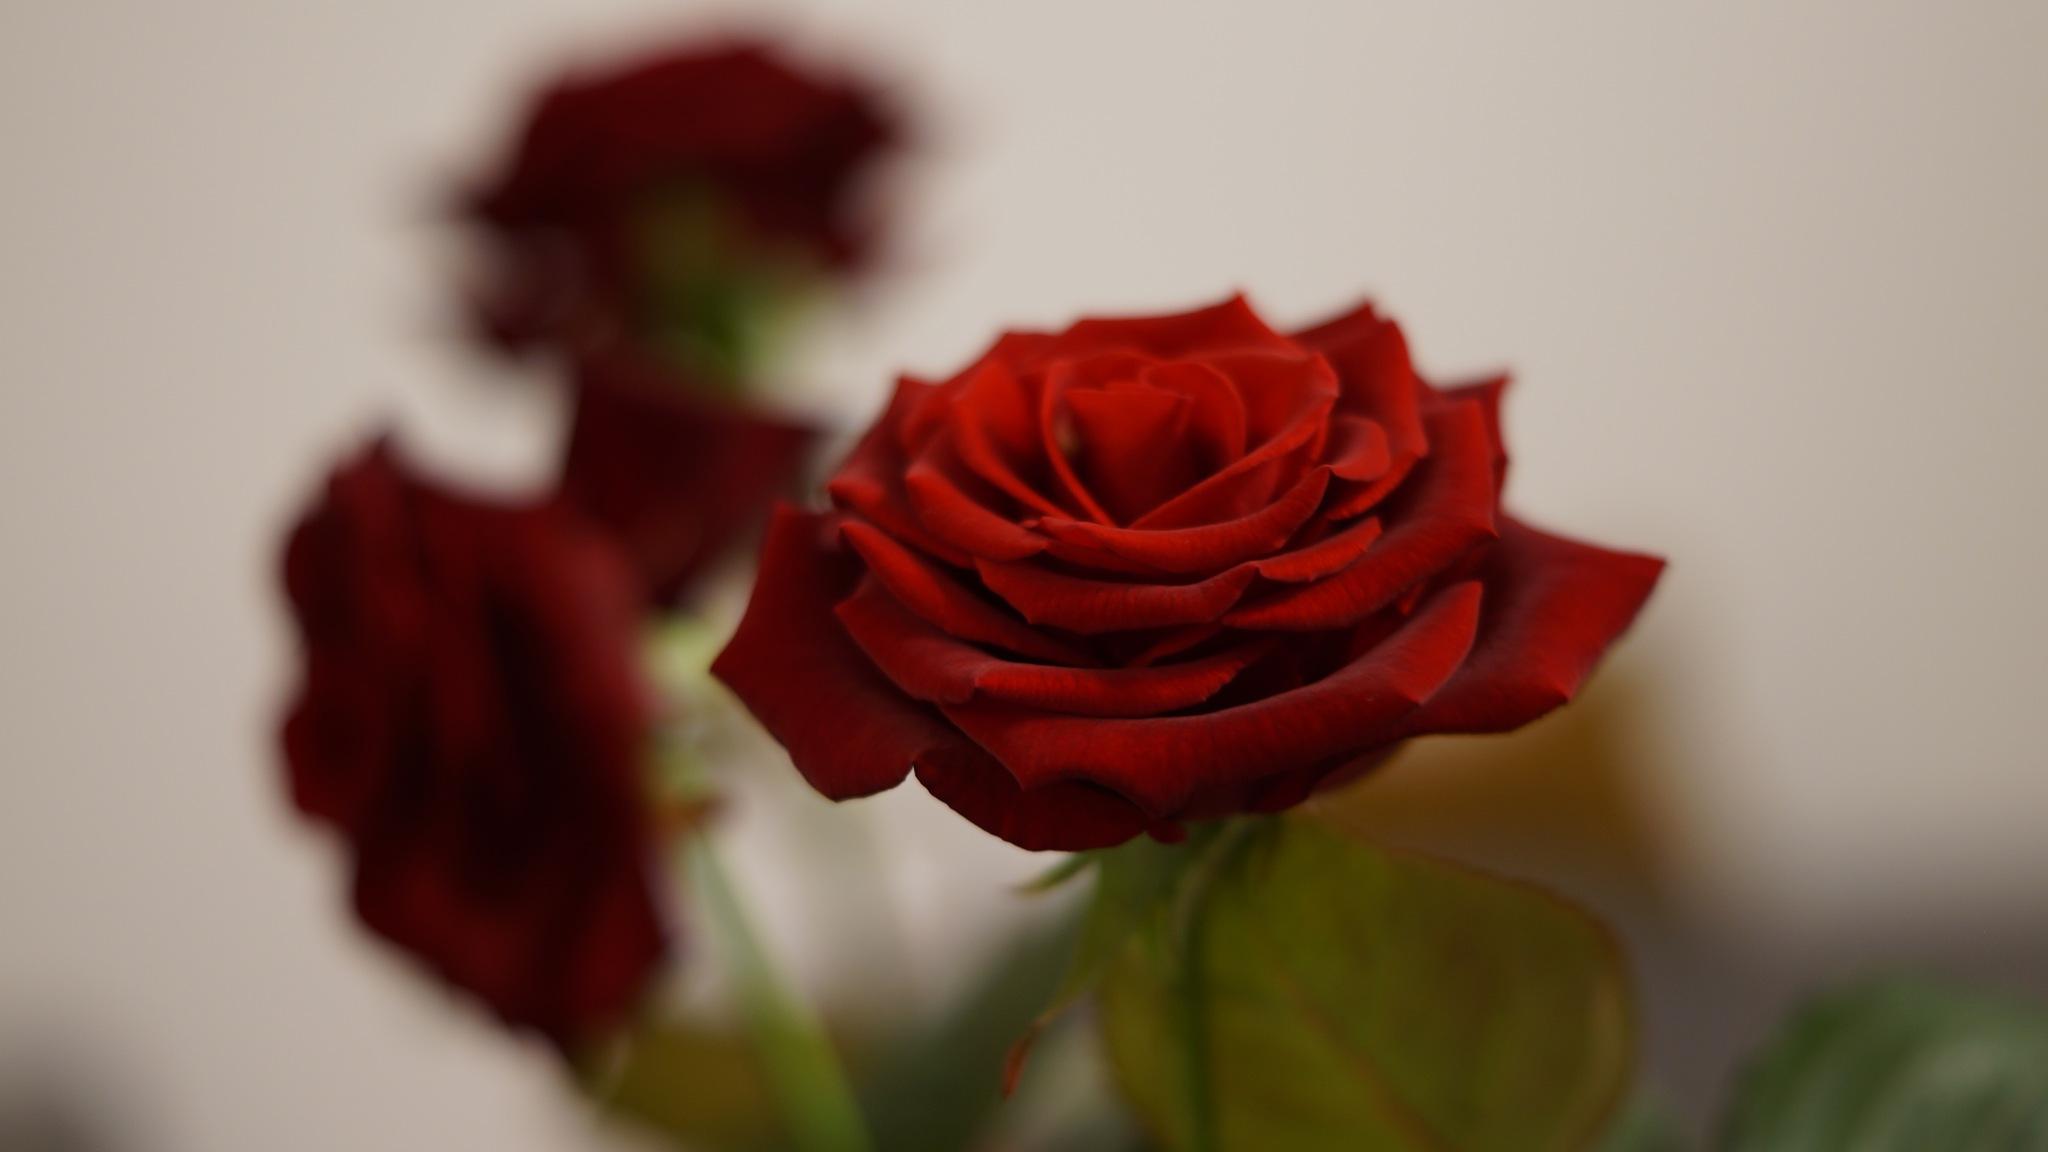 Roses by Jārėk Wālijėwski